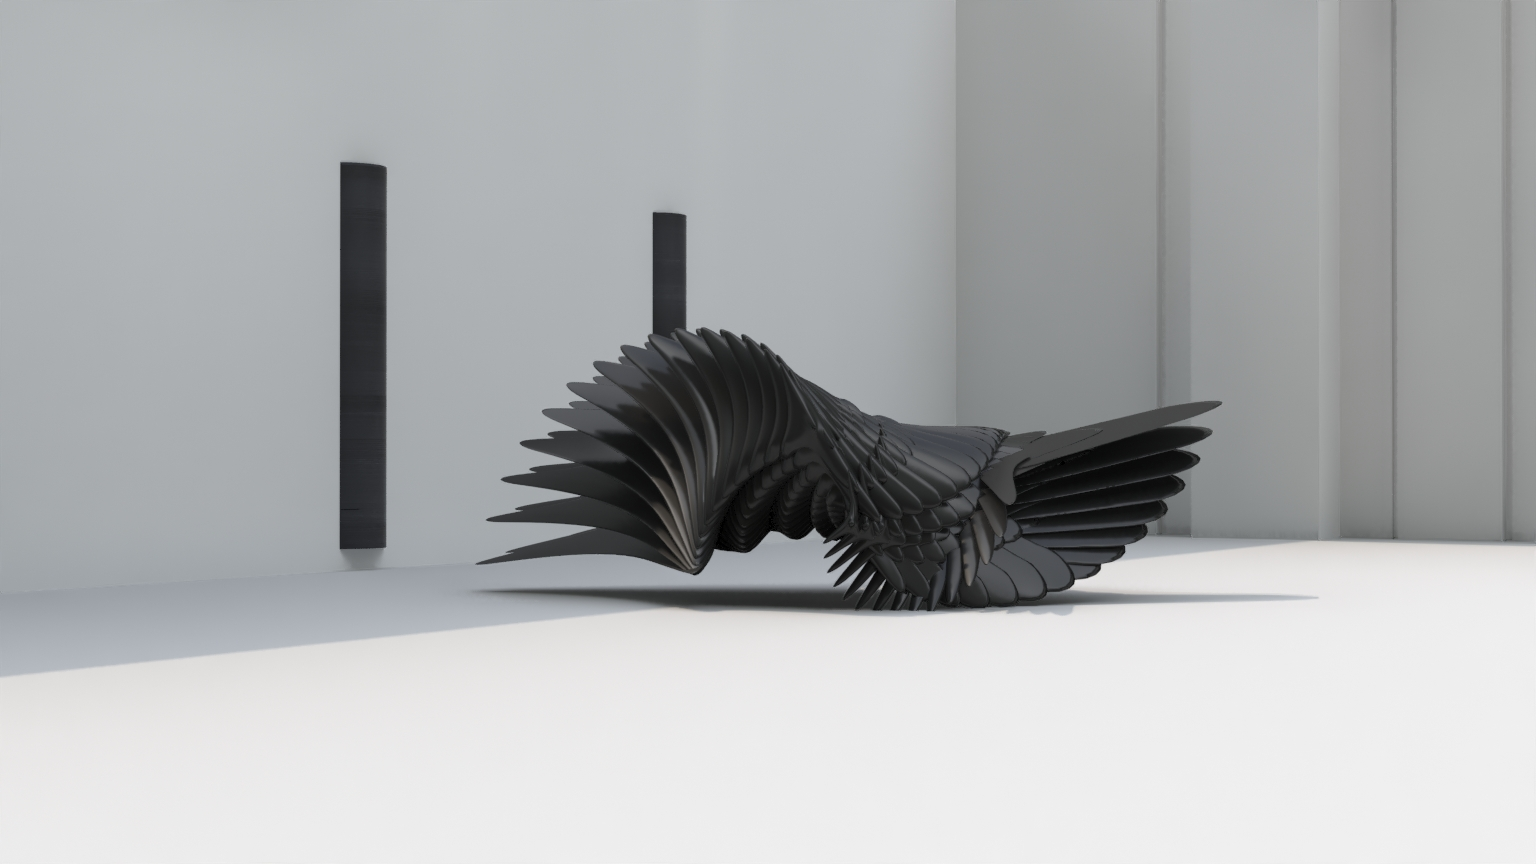 An Angels Wing_03.jpg